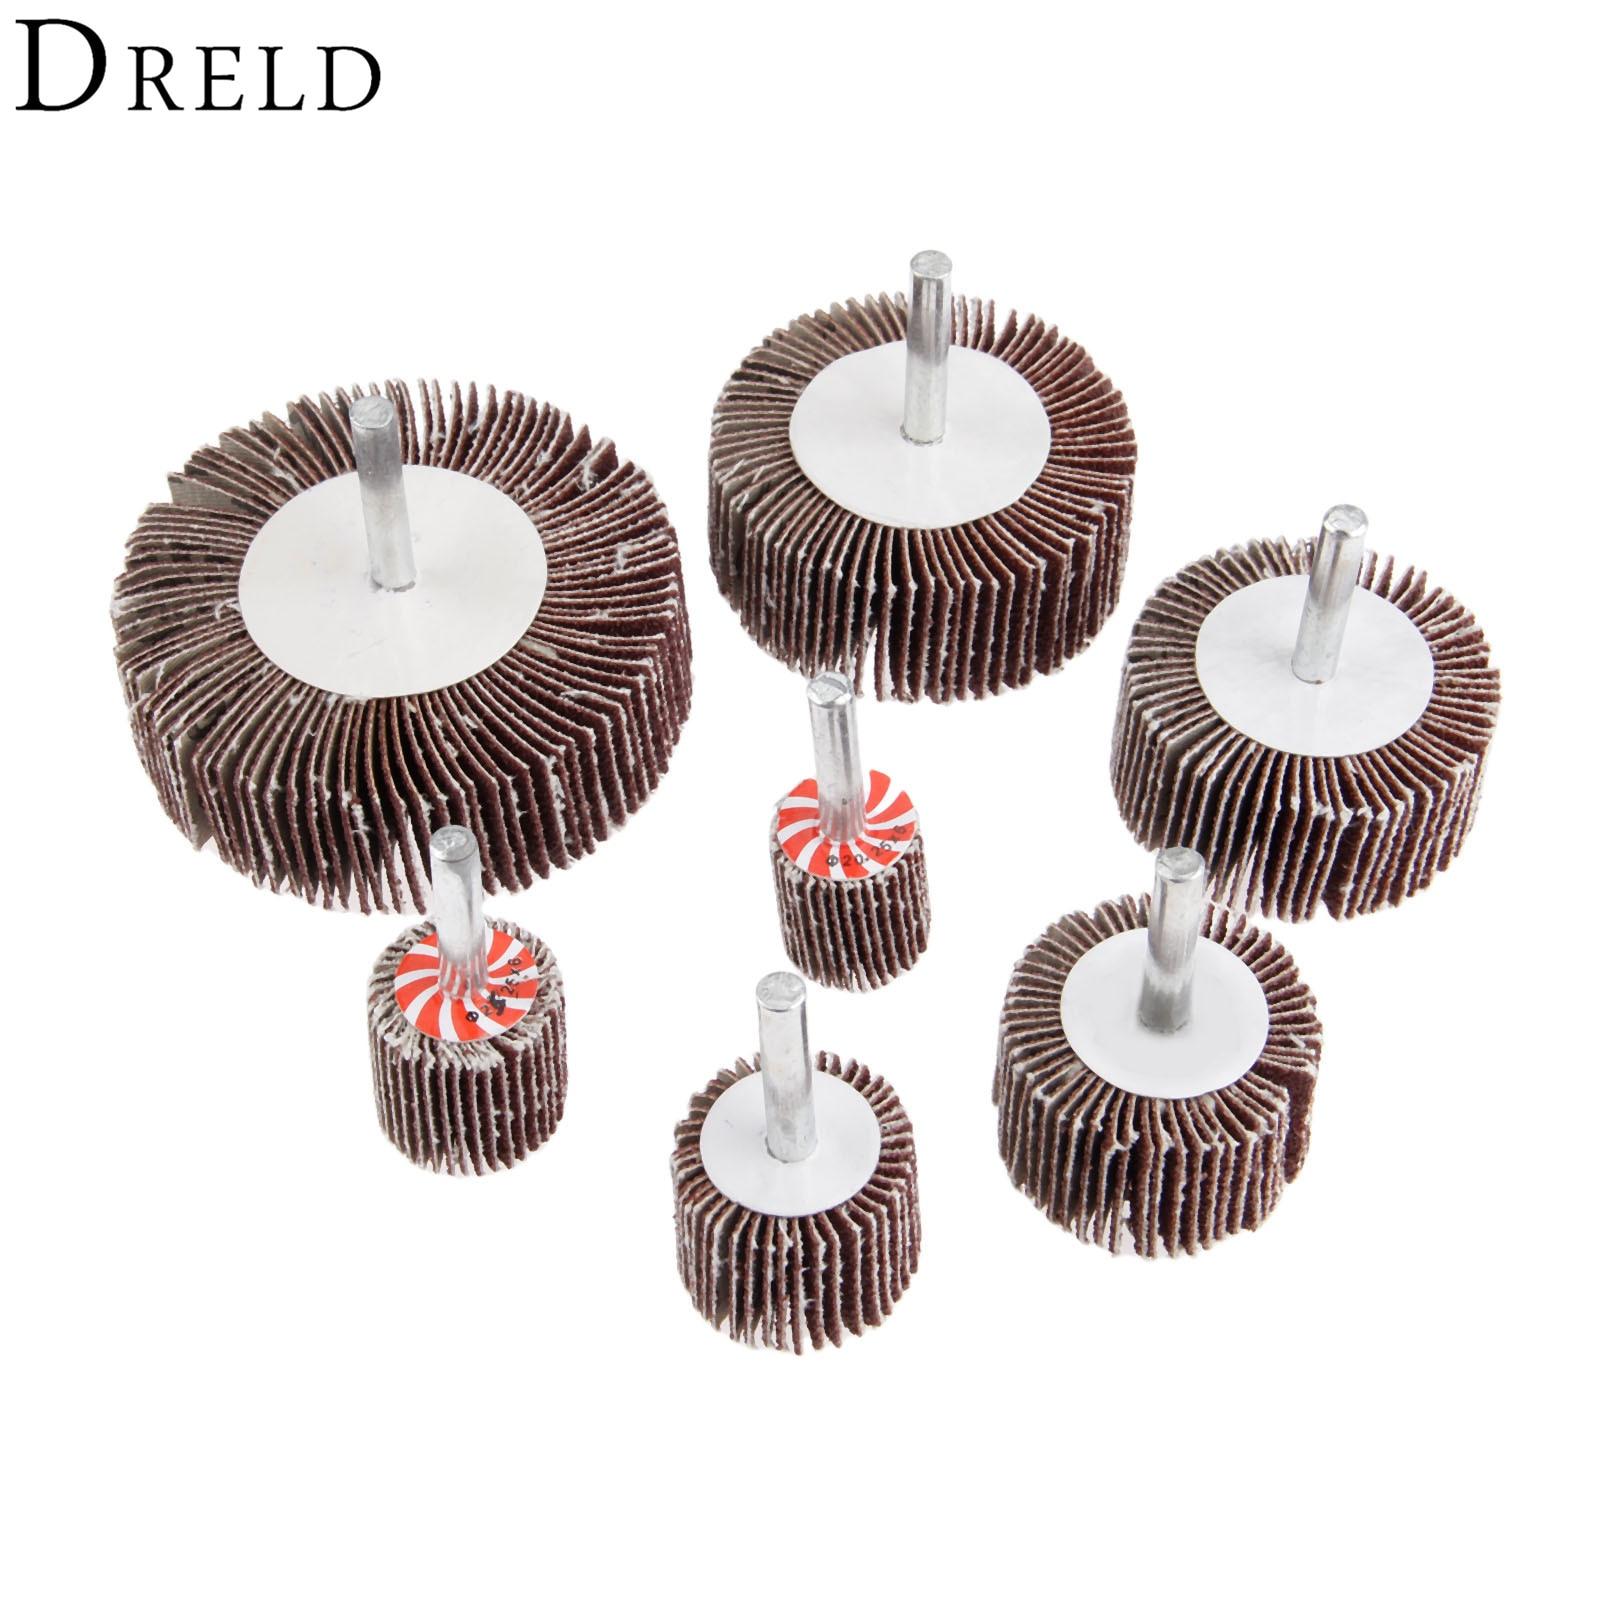 DRELD Grit 80# Grinding Sandpaper Sanding Flap Wheel Head 6mm Shank Mandrel For Rotary Drill Polishing Tool Dremel Accessories